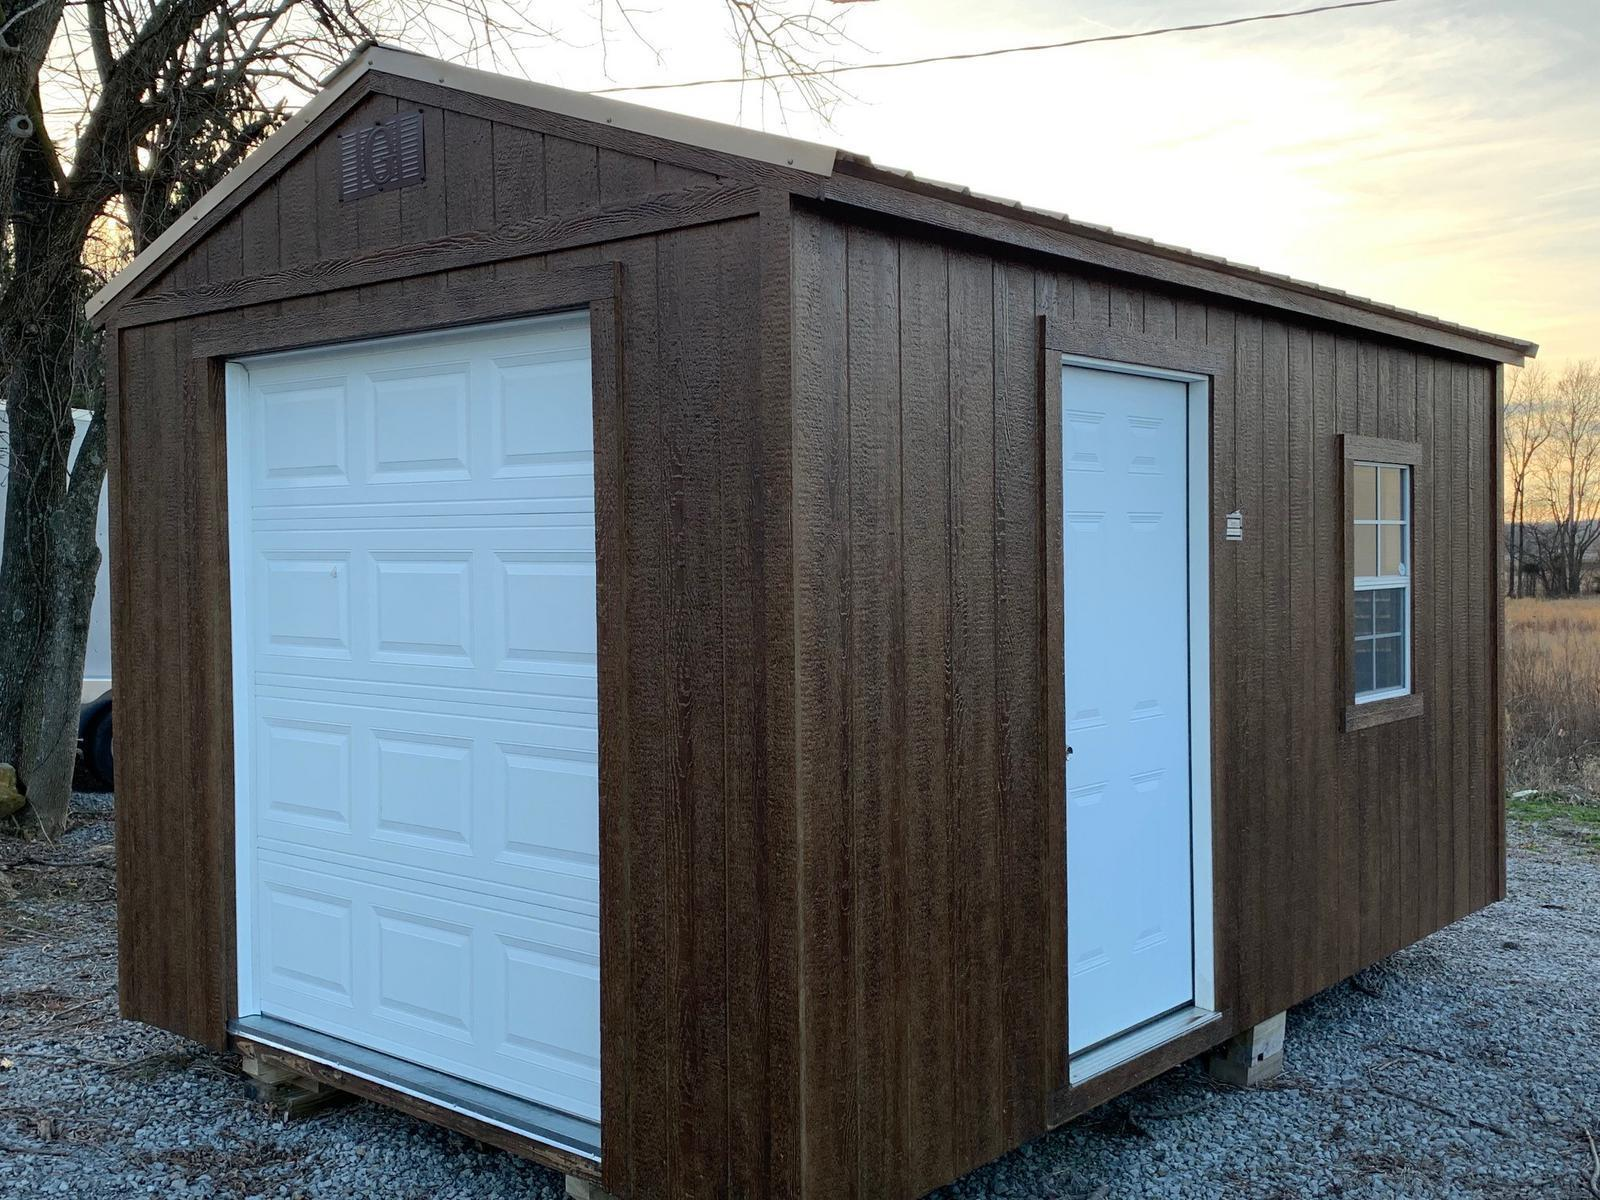 Express Storage Buildings Portable Garage - $118/Month SALE